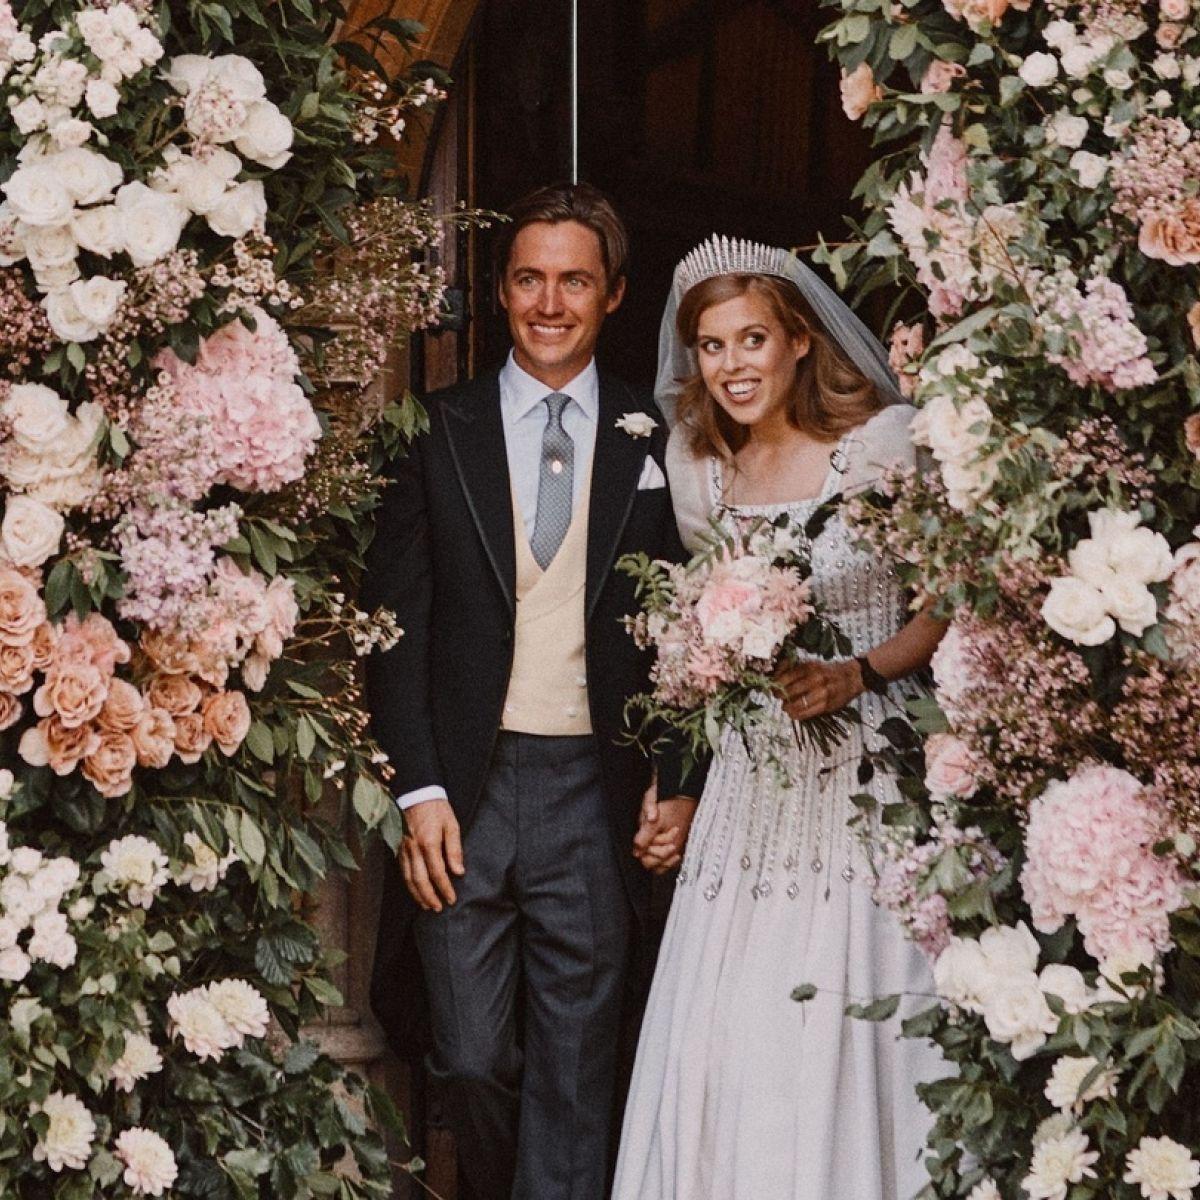 Britain S Princess Beatrice Marries In Dress And Tiara Borrowed